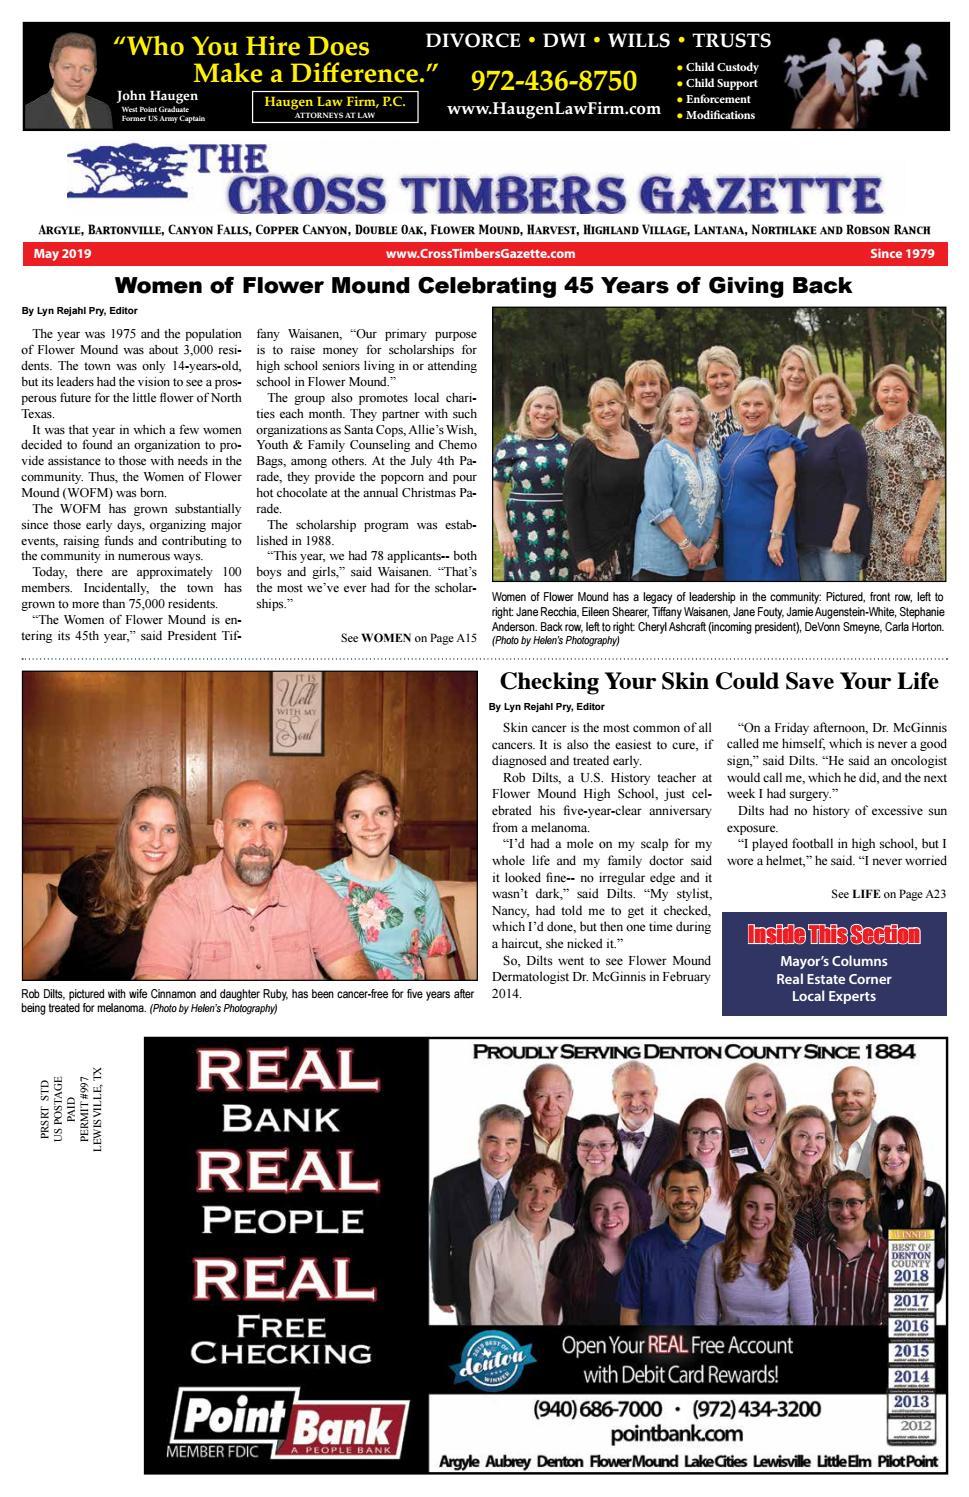 The Cross Timbers Gazette May 2019 by The Cross Timbers Gazette - issuu